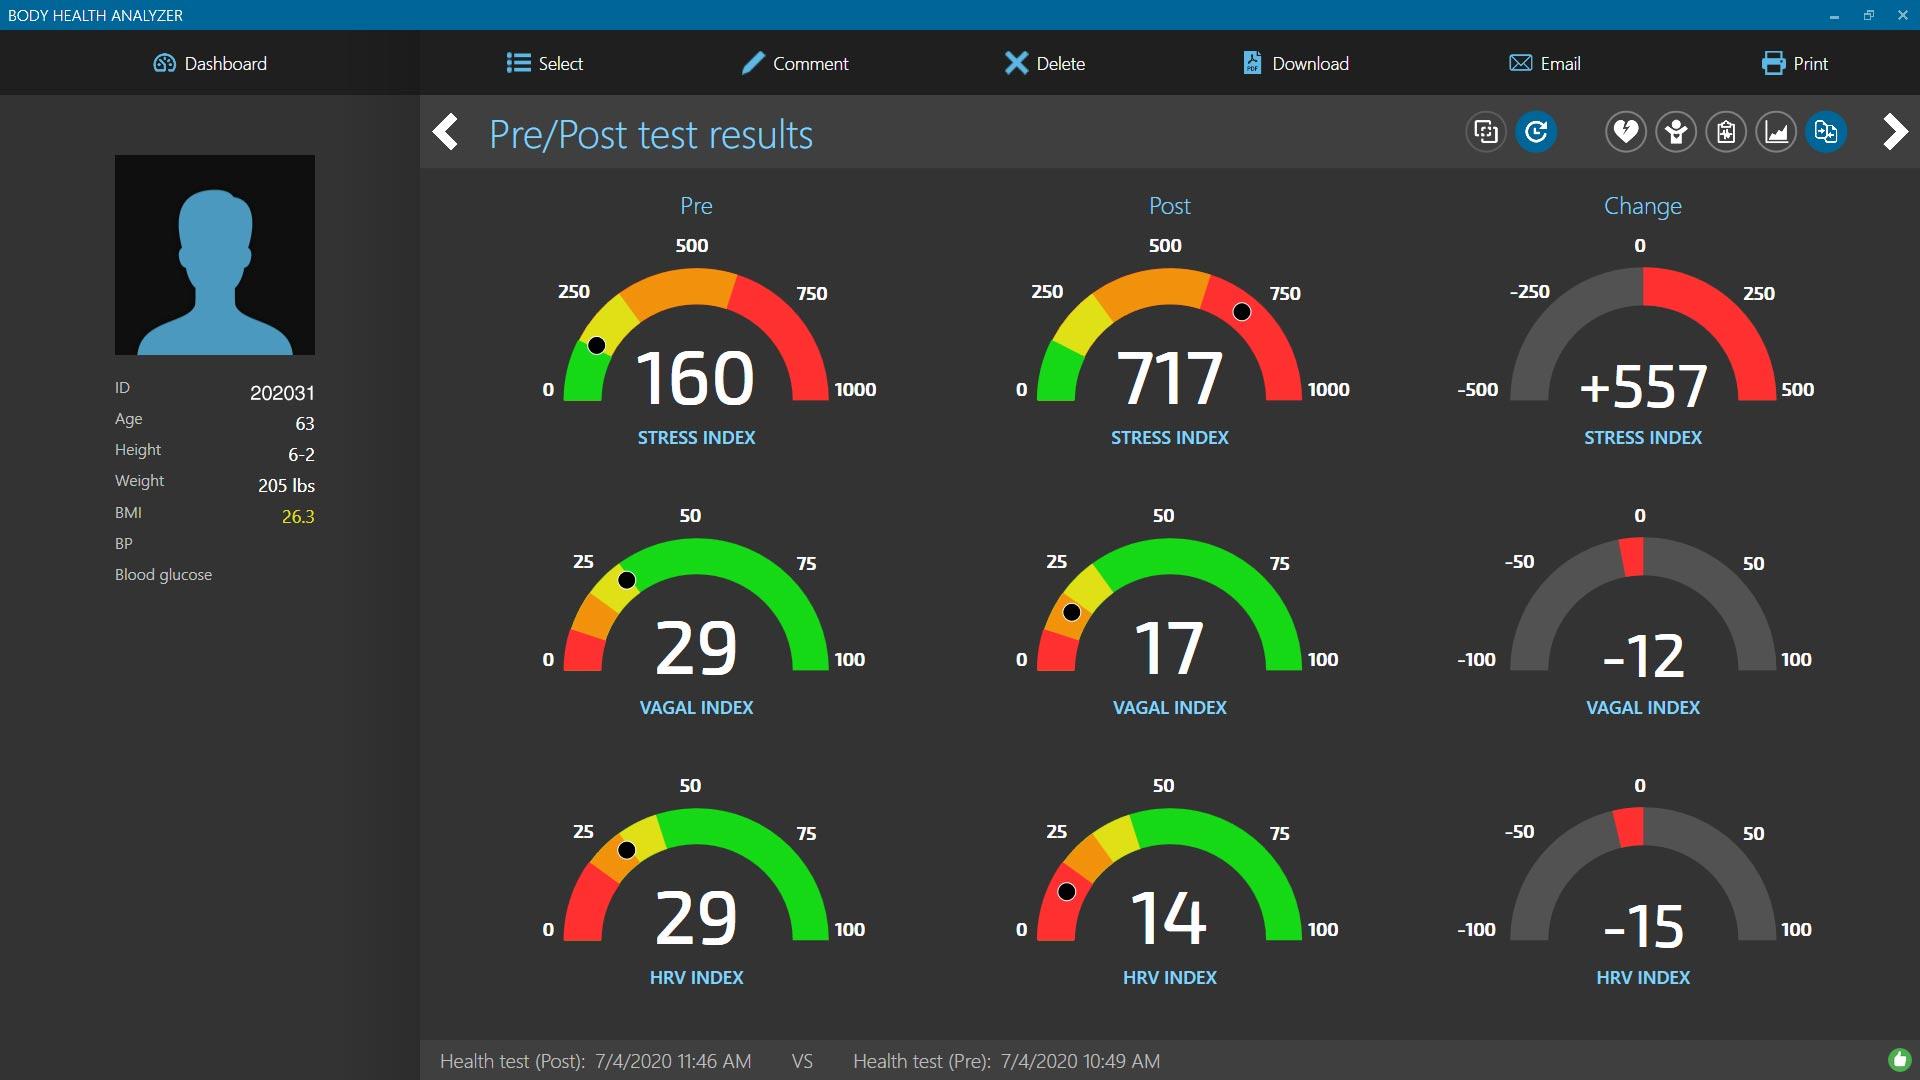 Body Health Analyzer Pre-Post Hill Climb Bike Report